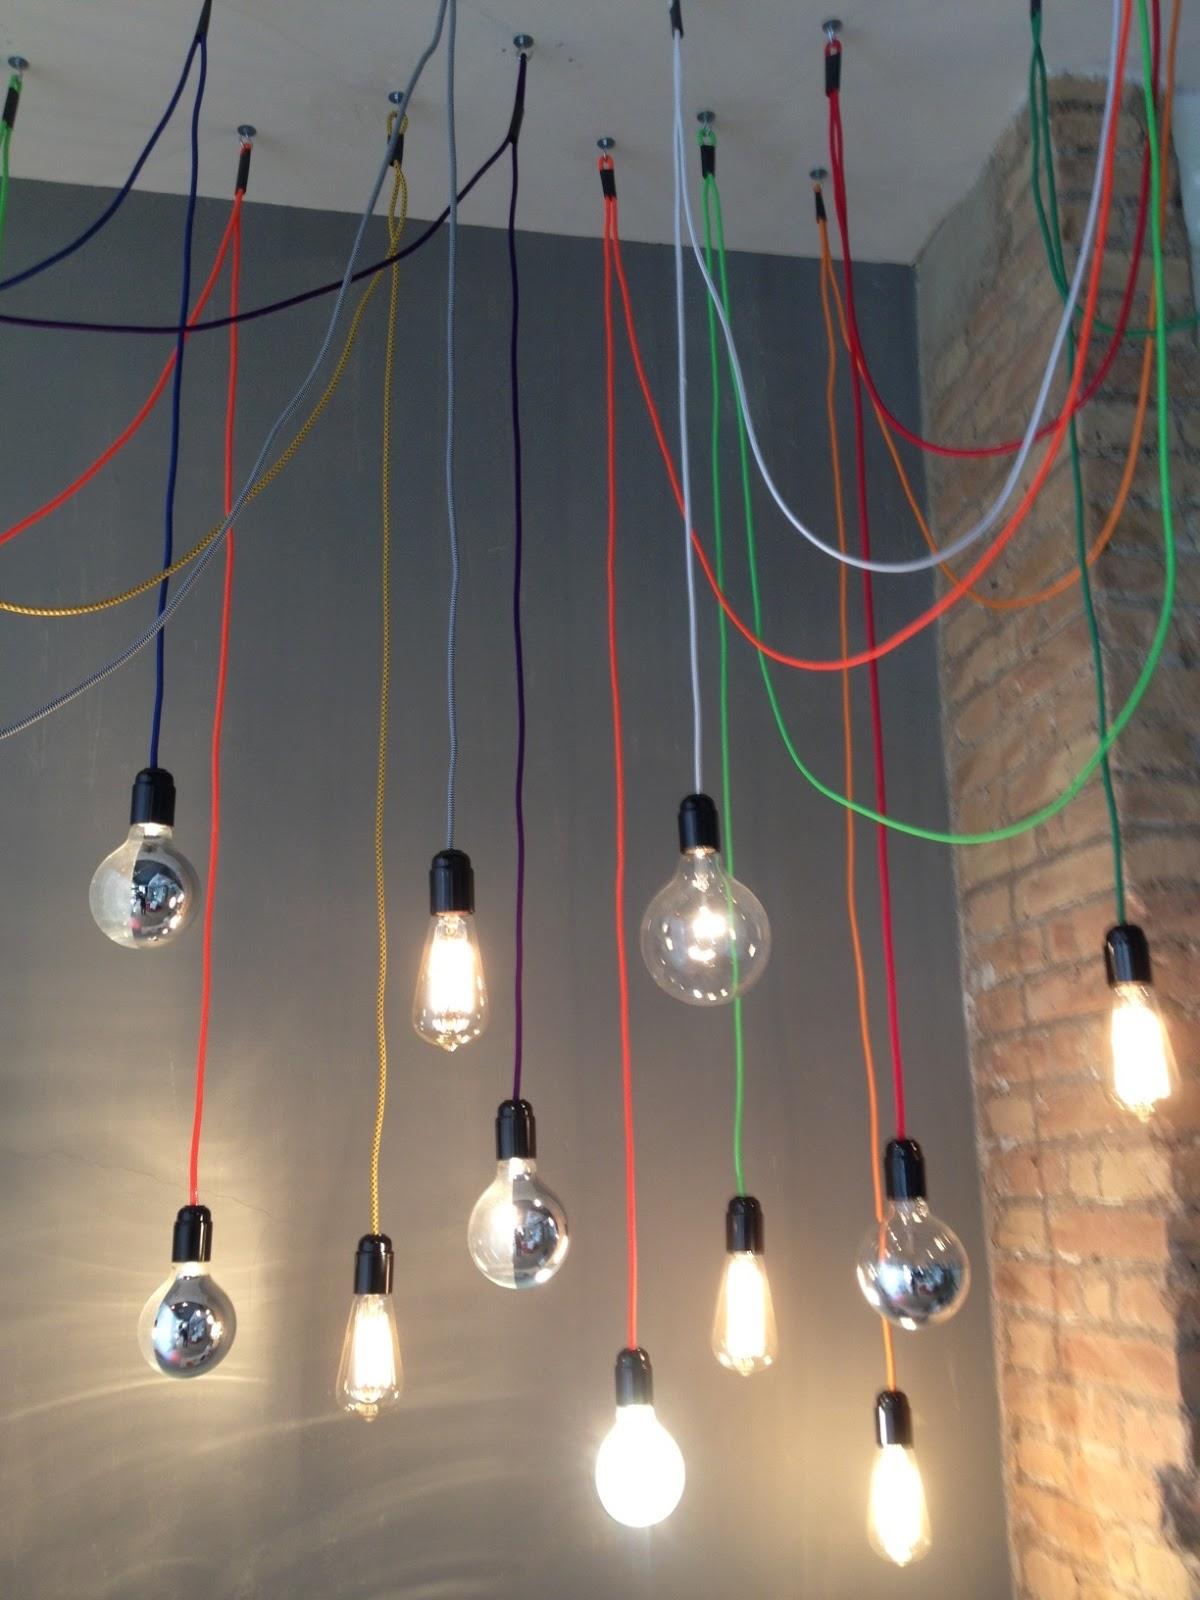 Lamparas urban vintage cables electricos de colores for Cables telefonillo colores